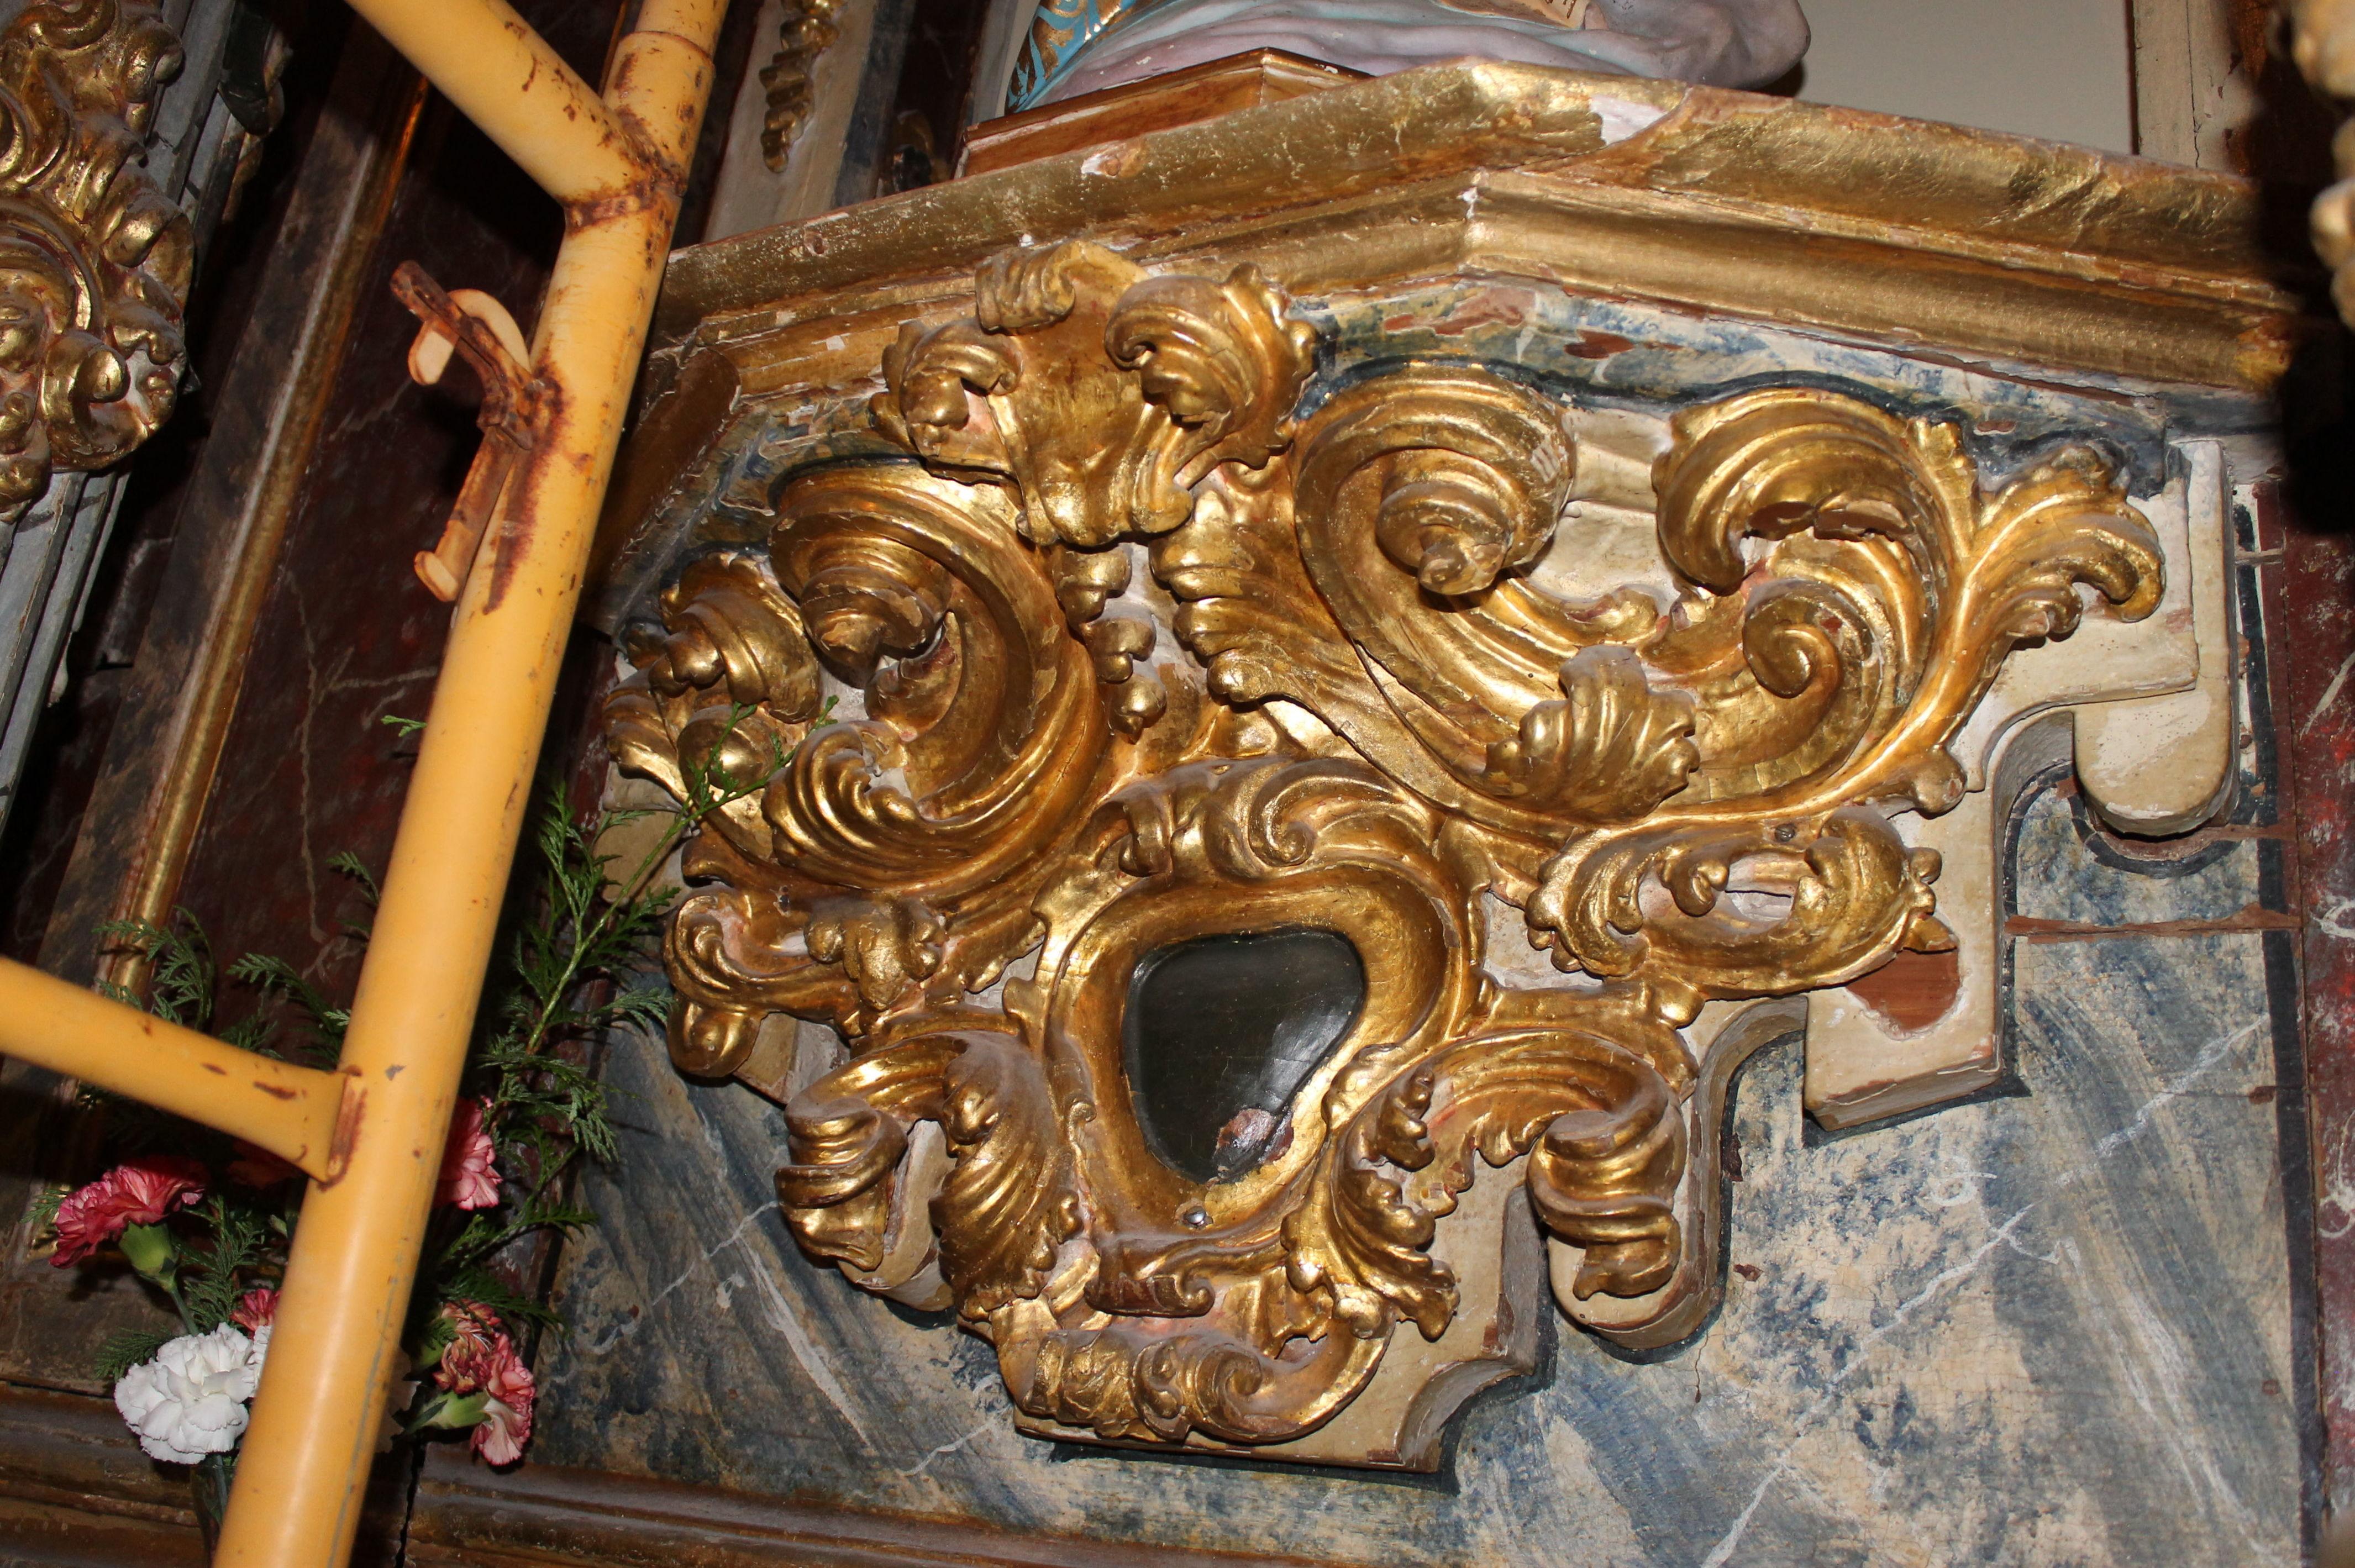 Carpintería de elementos decorativos en iglesias